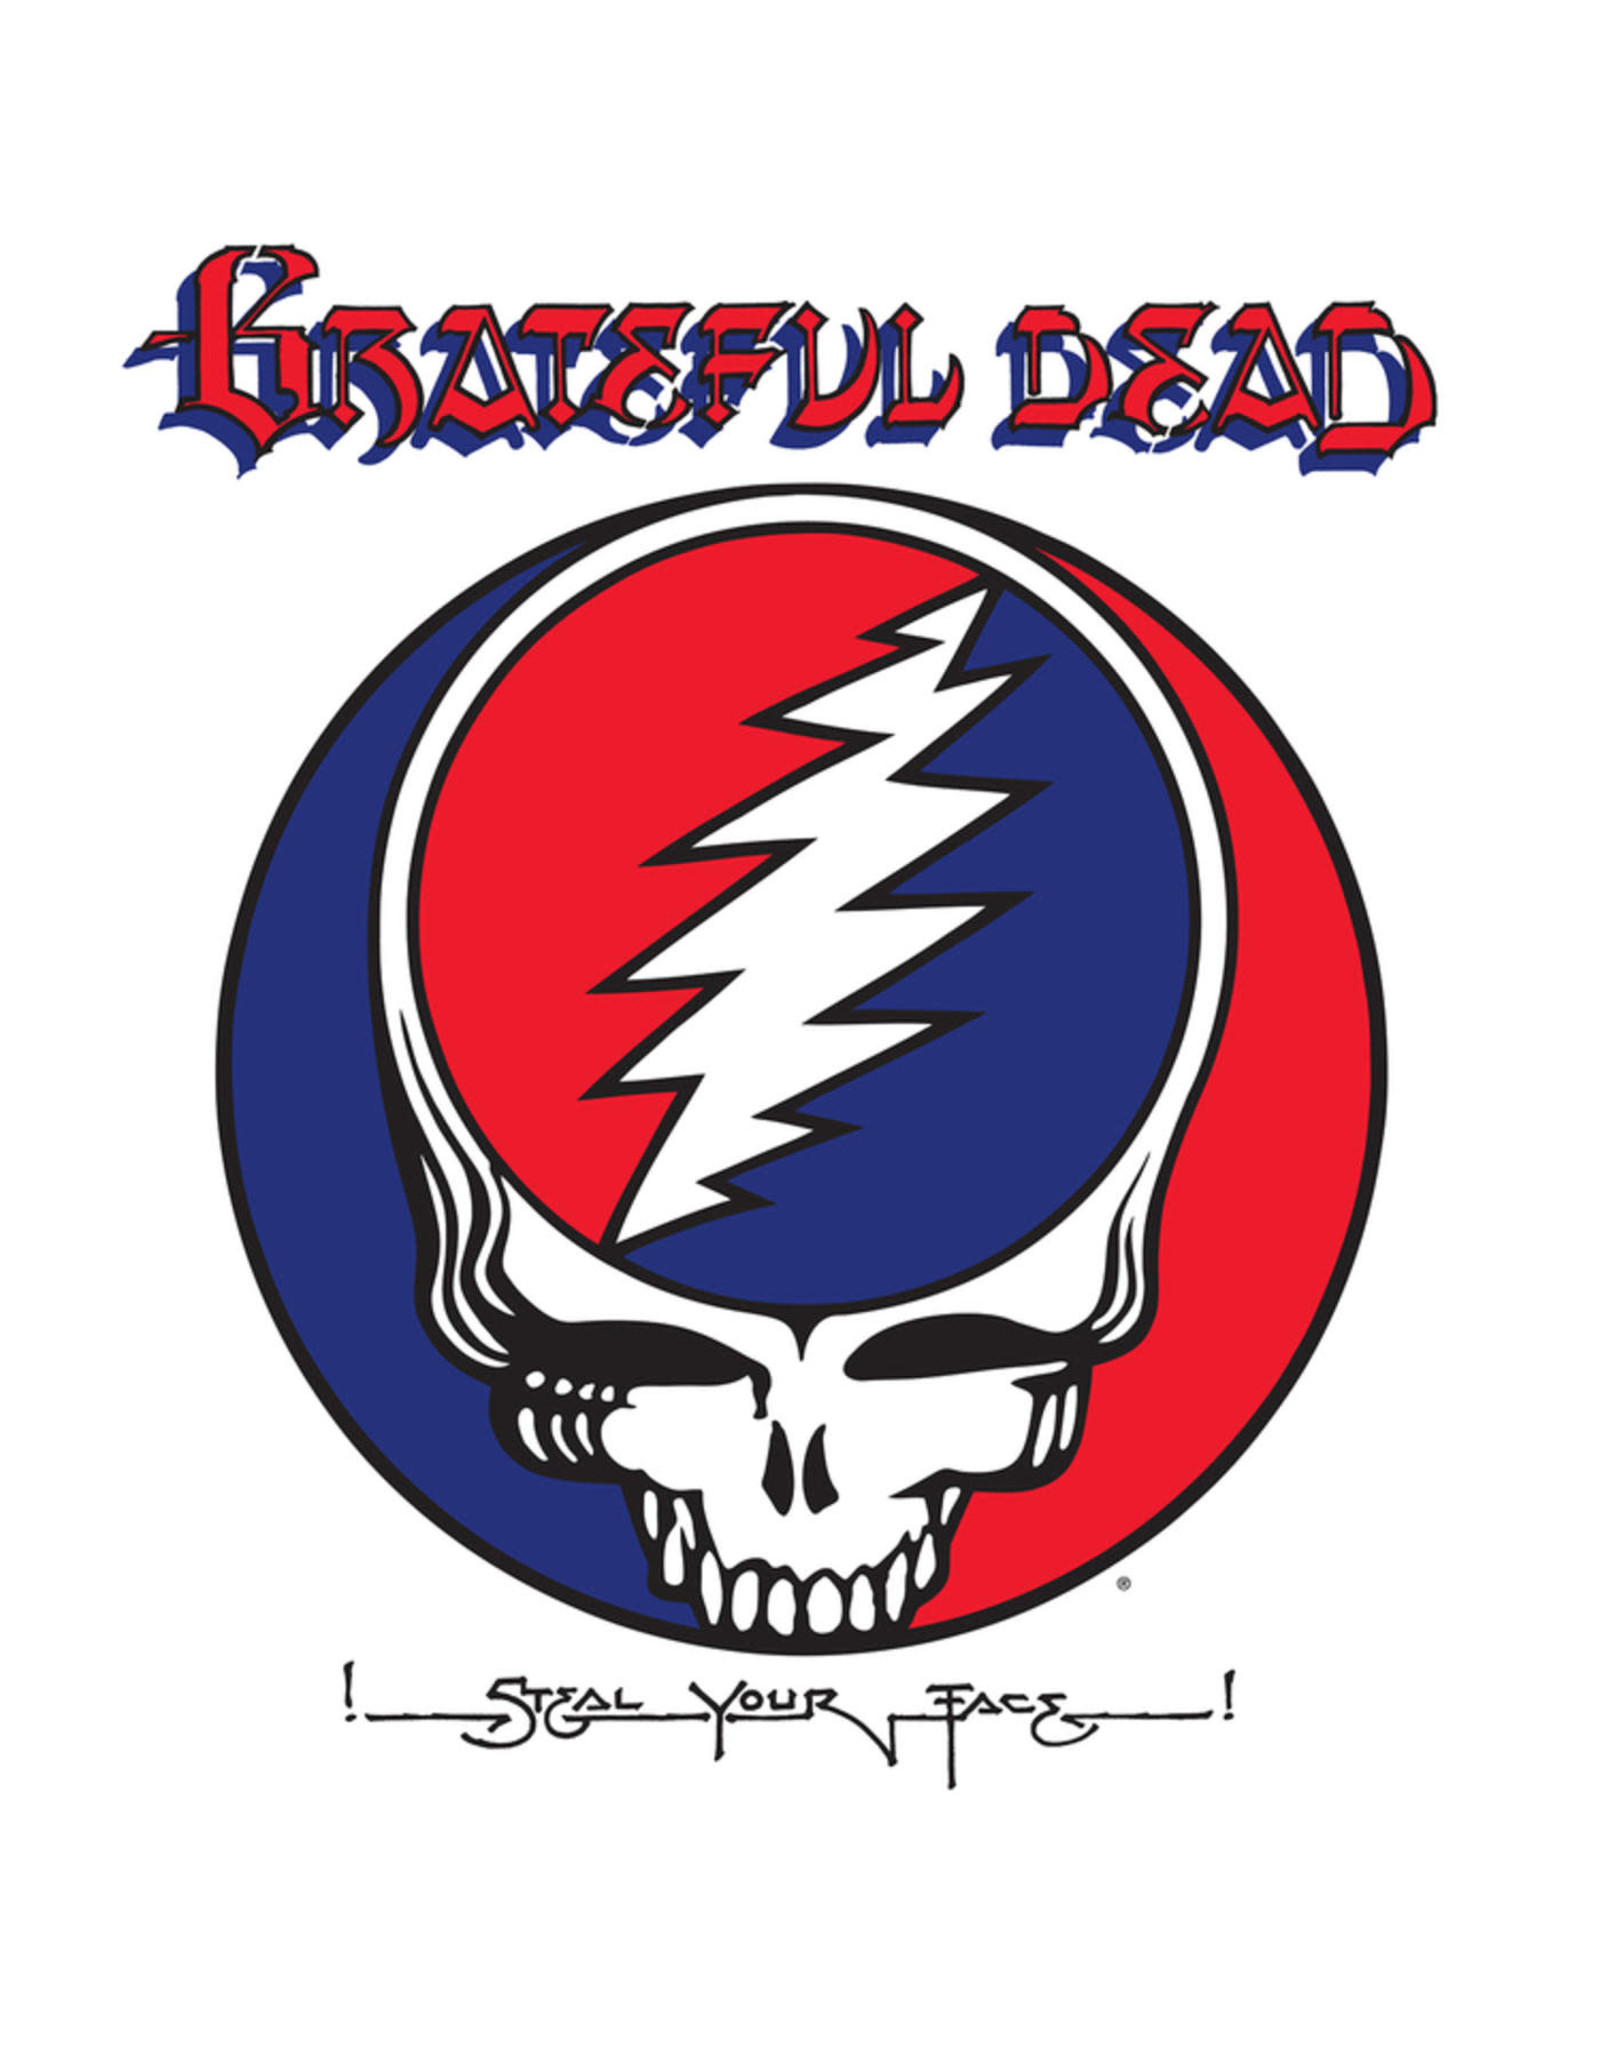 Grateful Dead - Steal Your Face (Rocktober 2018)